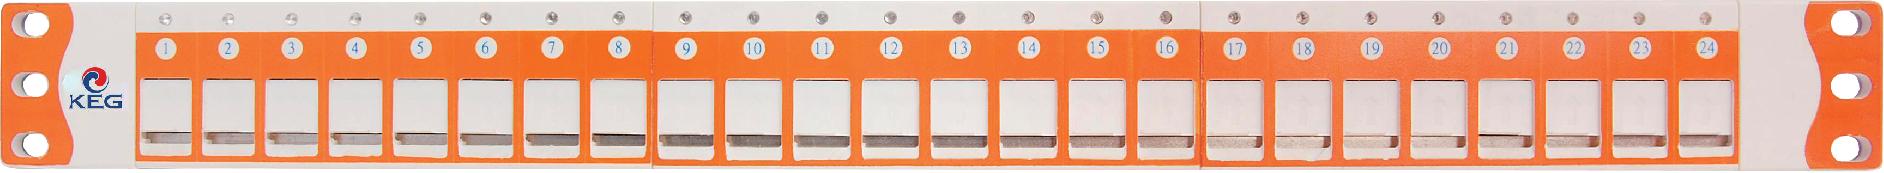 KEG波多野结衣中文字幕智能电子配线管理系统